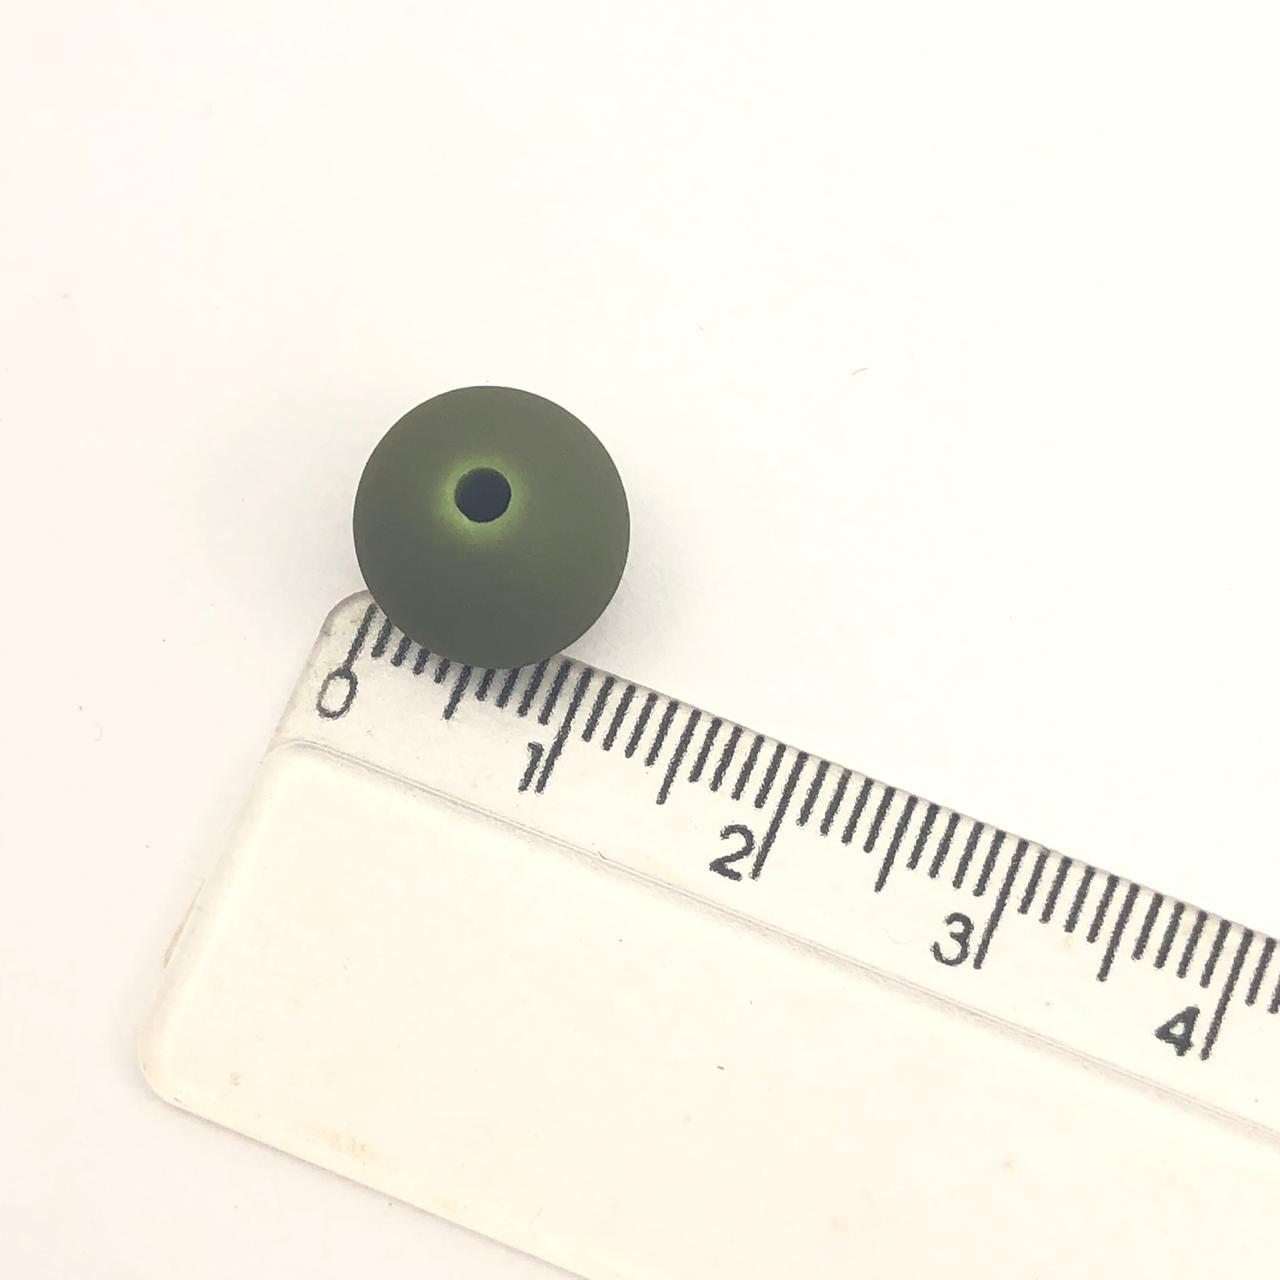 BOL284 - Bola Emborrachada Verde Musgo 12mm - 20Grs